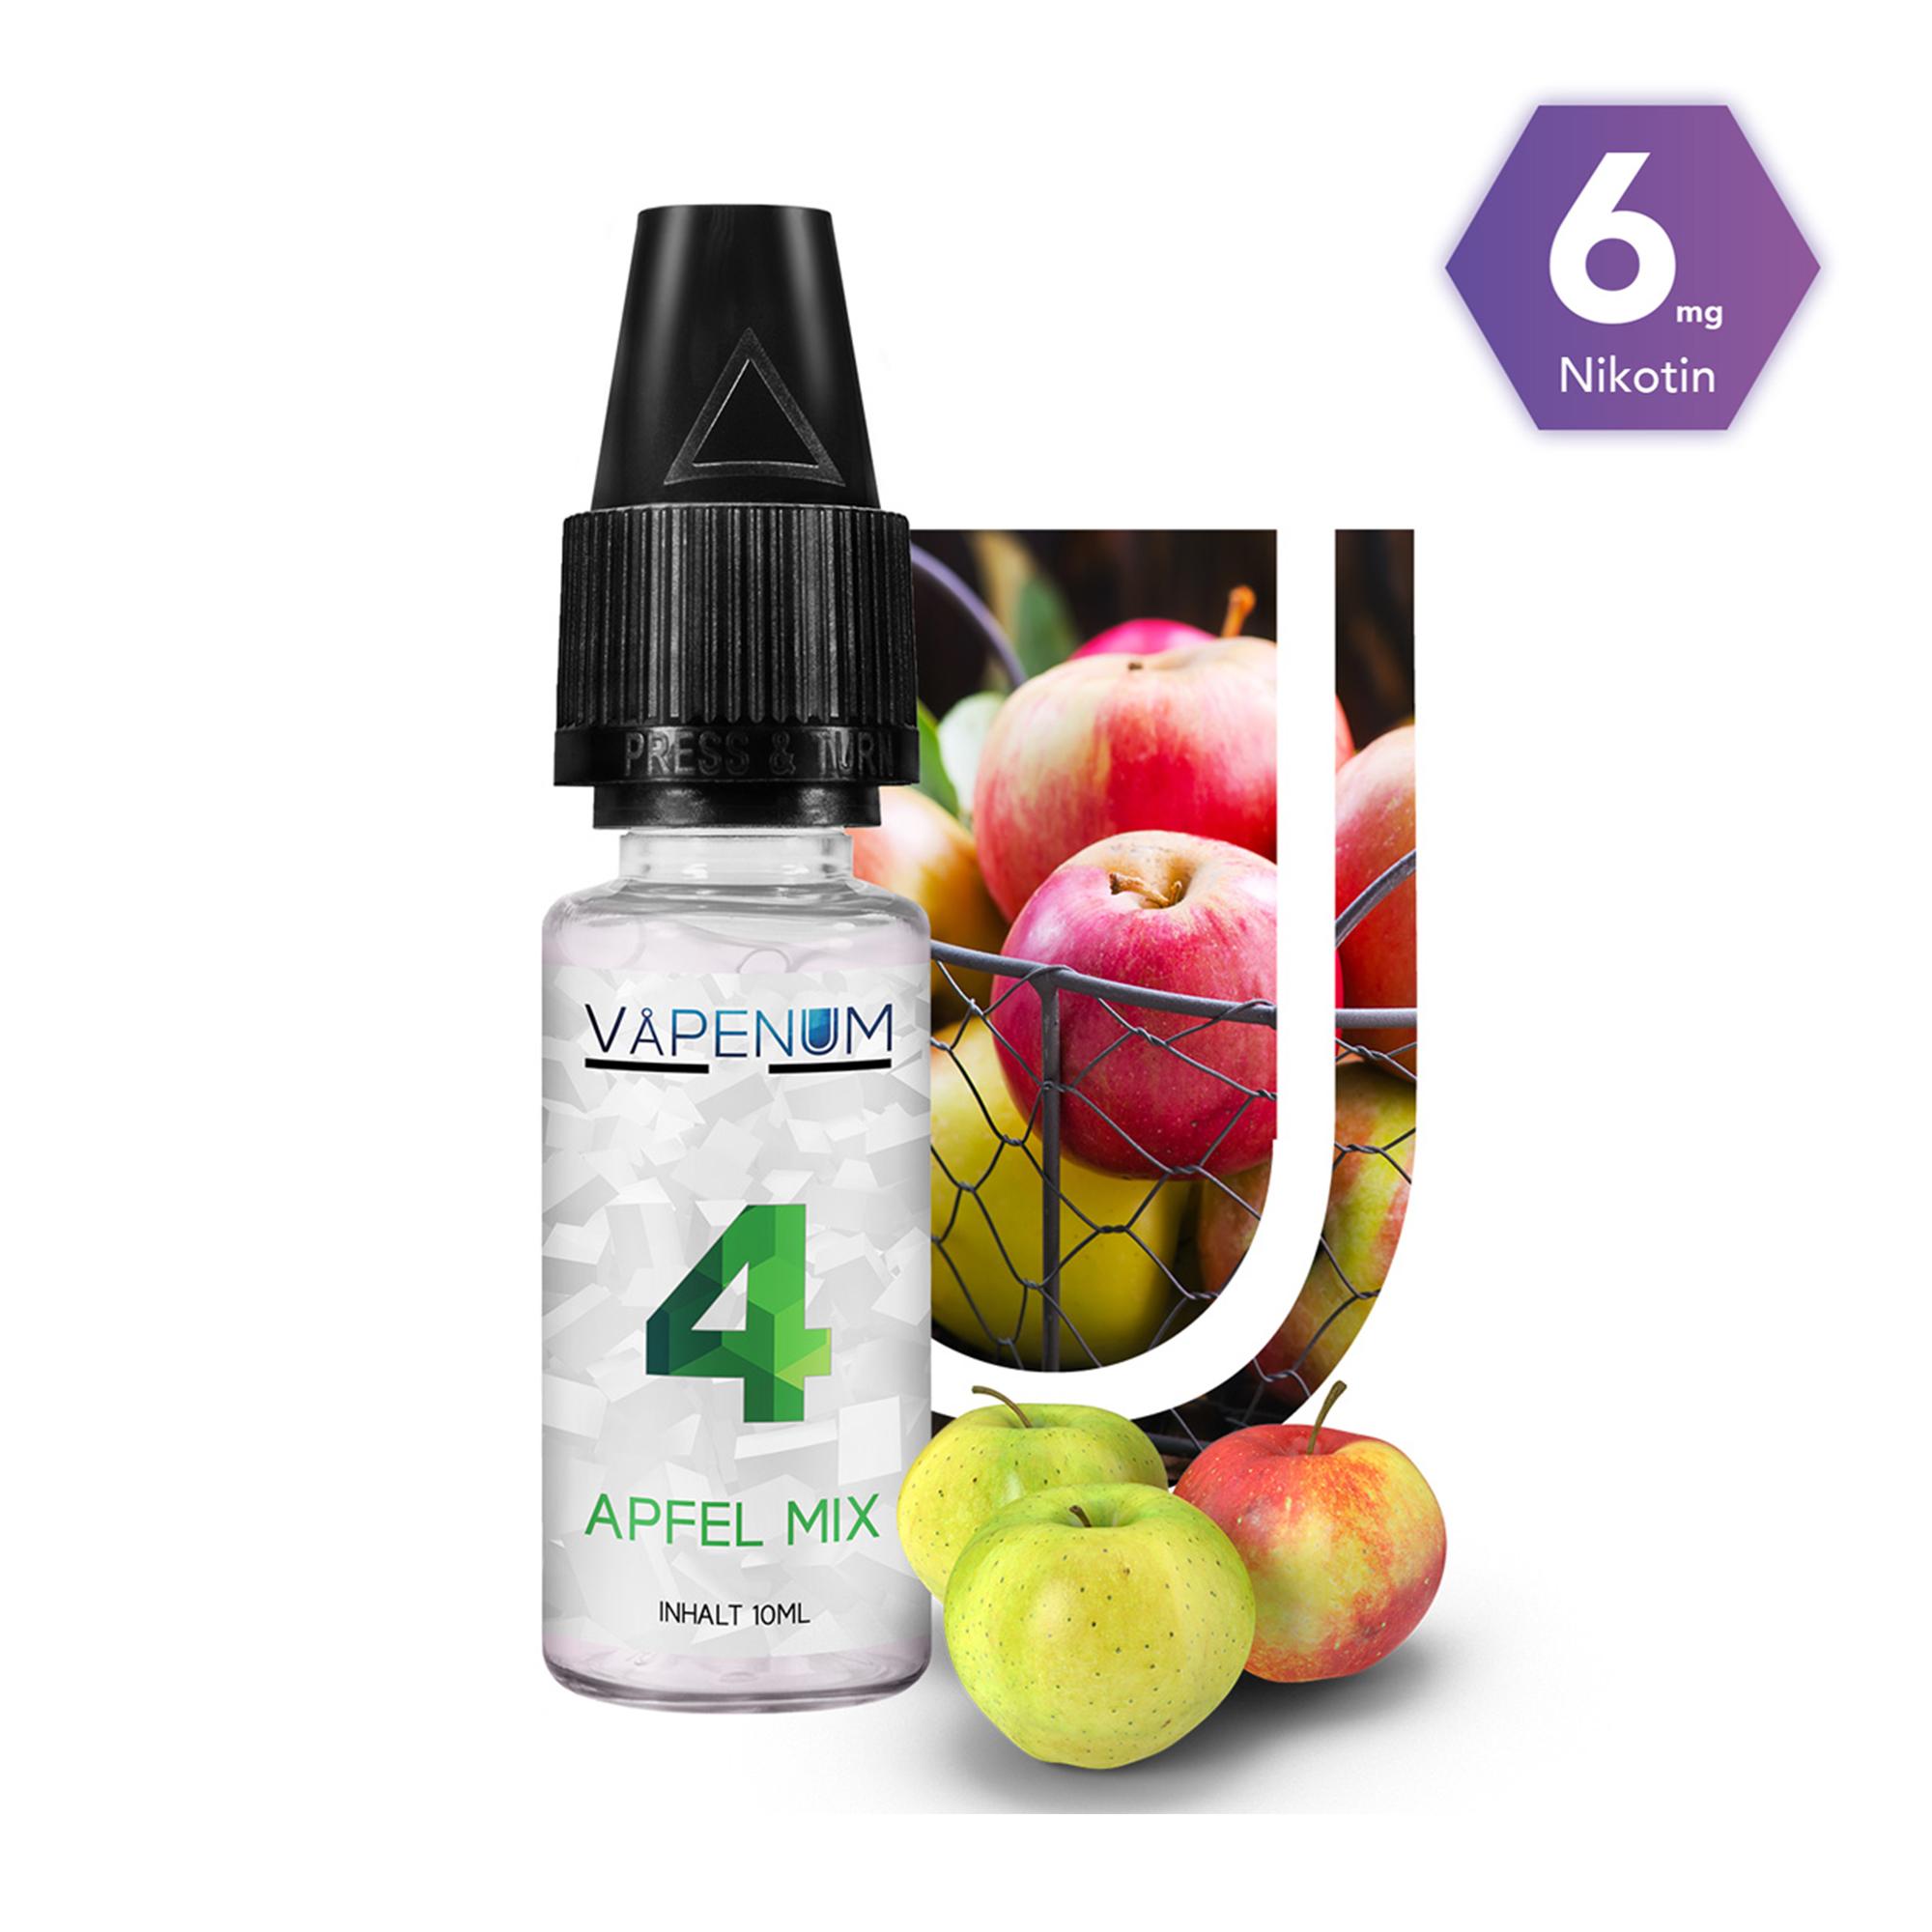 4 - Apfel Mix  Liquid by Vapenum 6mg